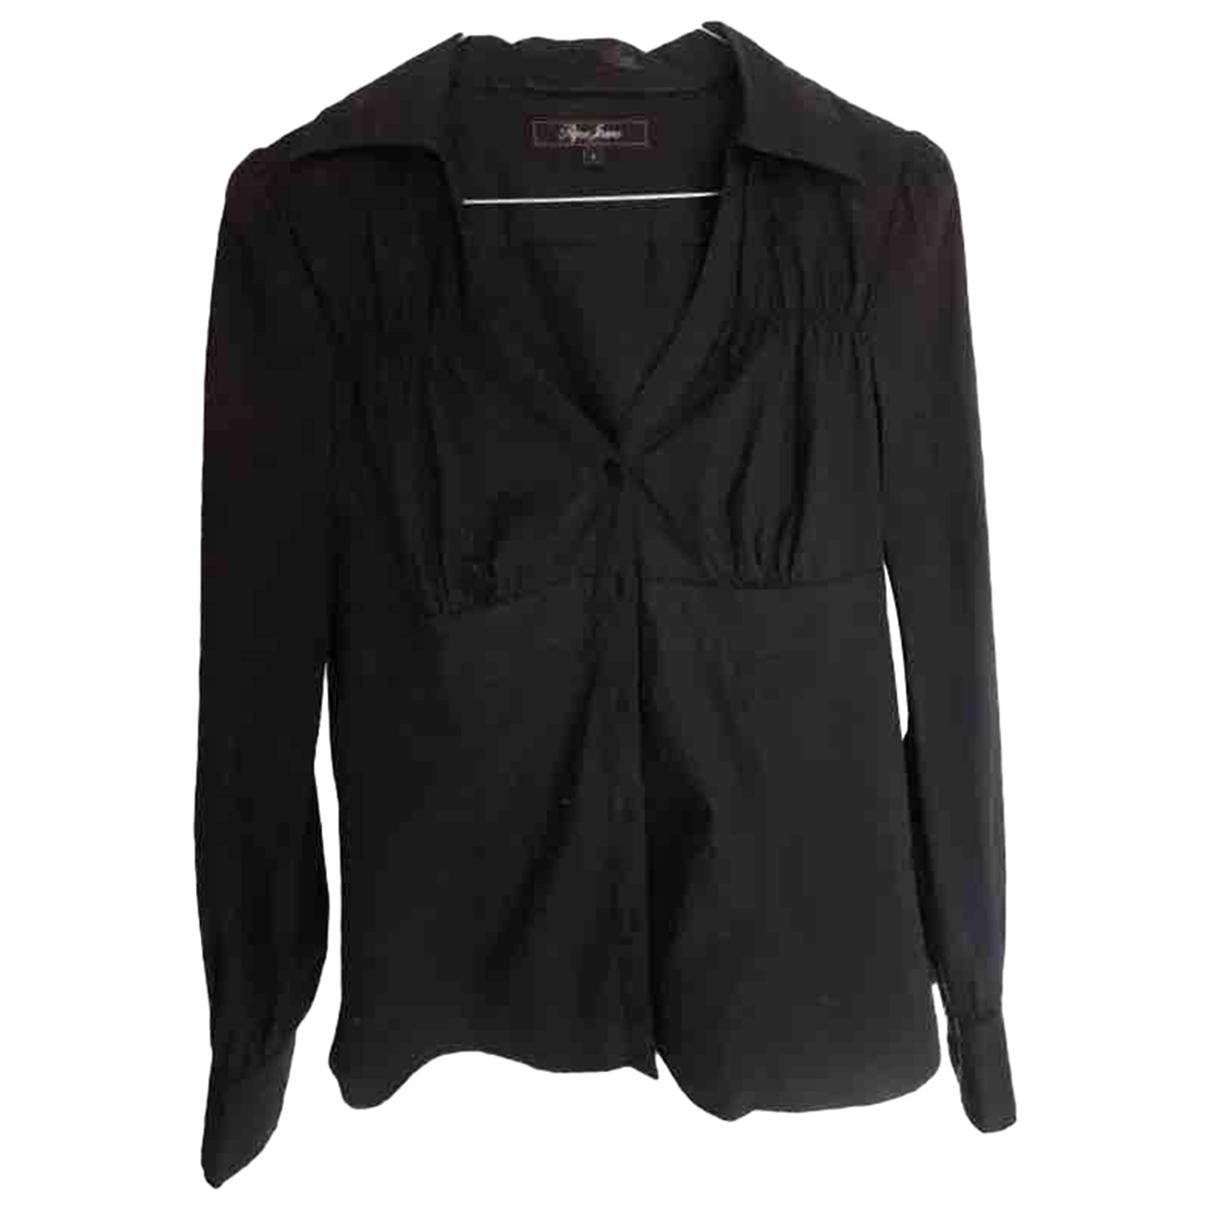 Patrizia Pepe \N Black Cotton Knitwear for Women S International